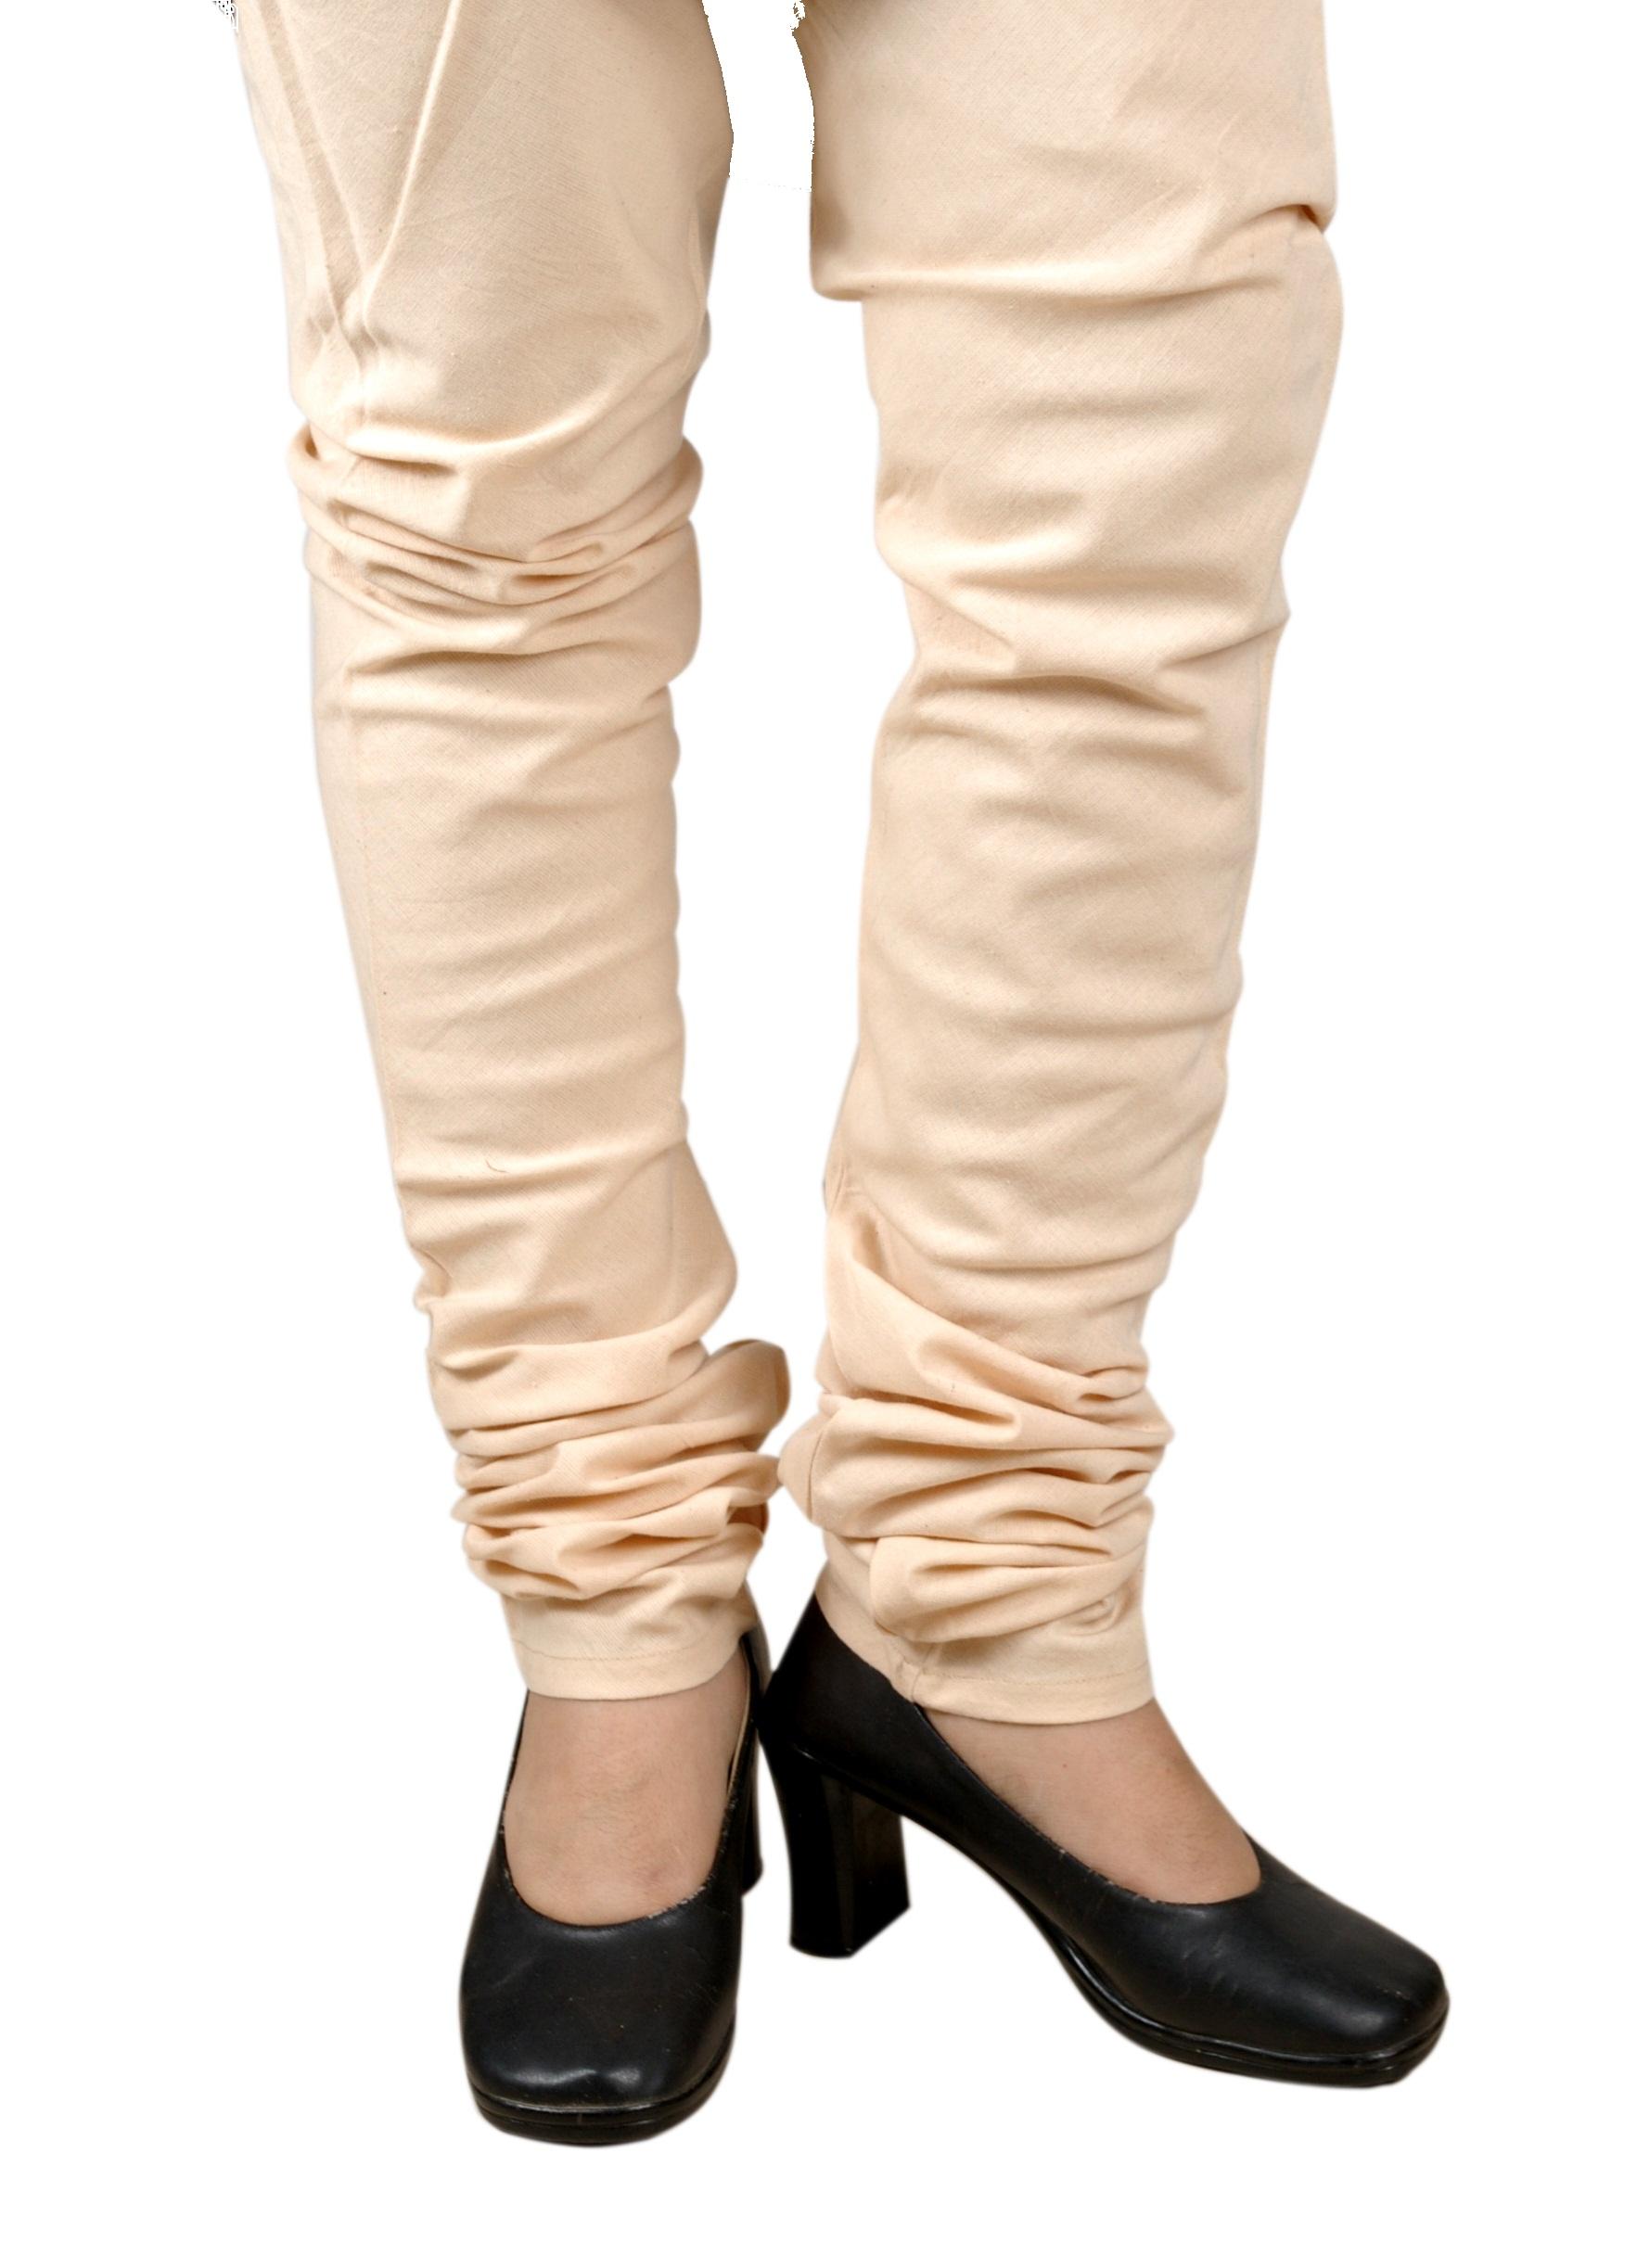 Cotton Churidars, Bottoms, Womens Wear, Indian Concepts, Beige Colour Churidar